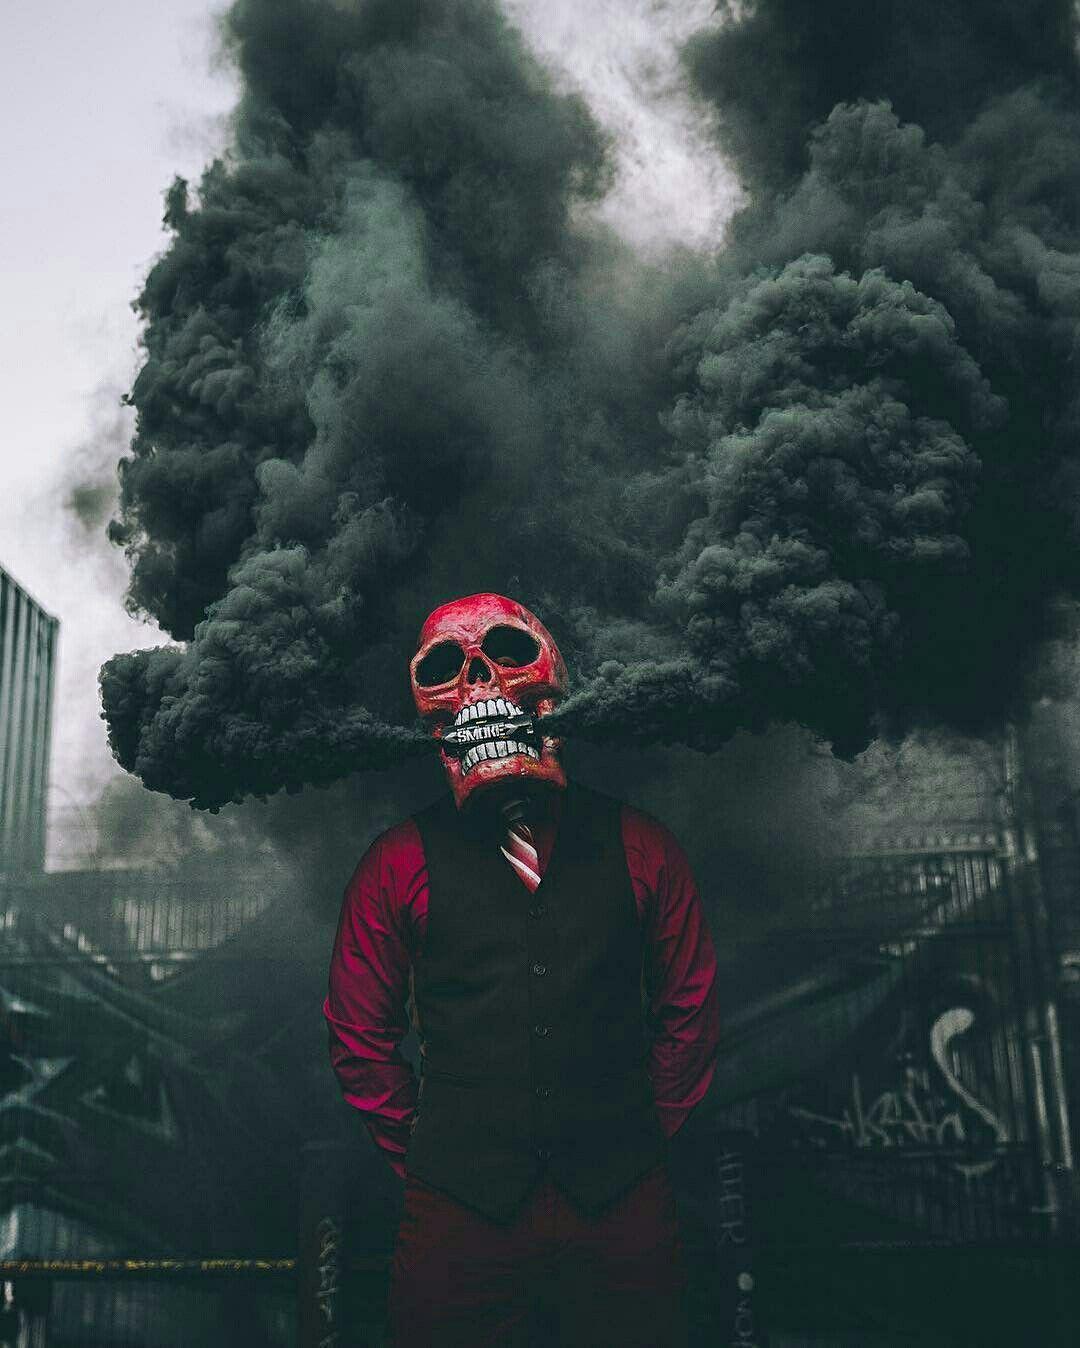 Hallucinations Graffiti Vape Wallpaper Iphone Wallpaper Smoke Photography Frames Butches